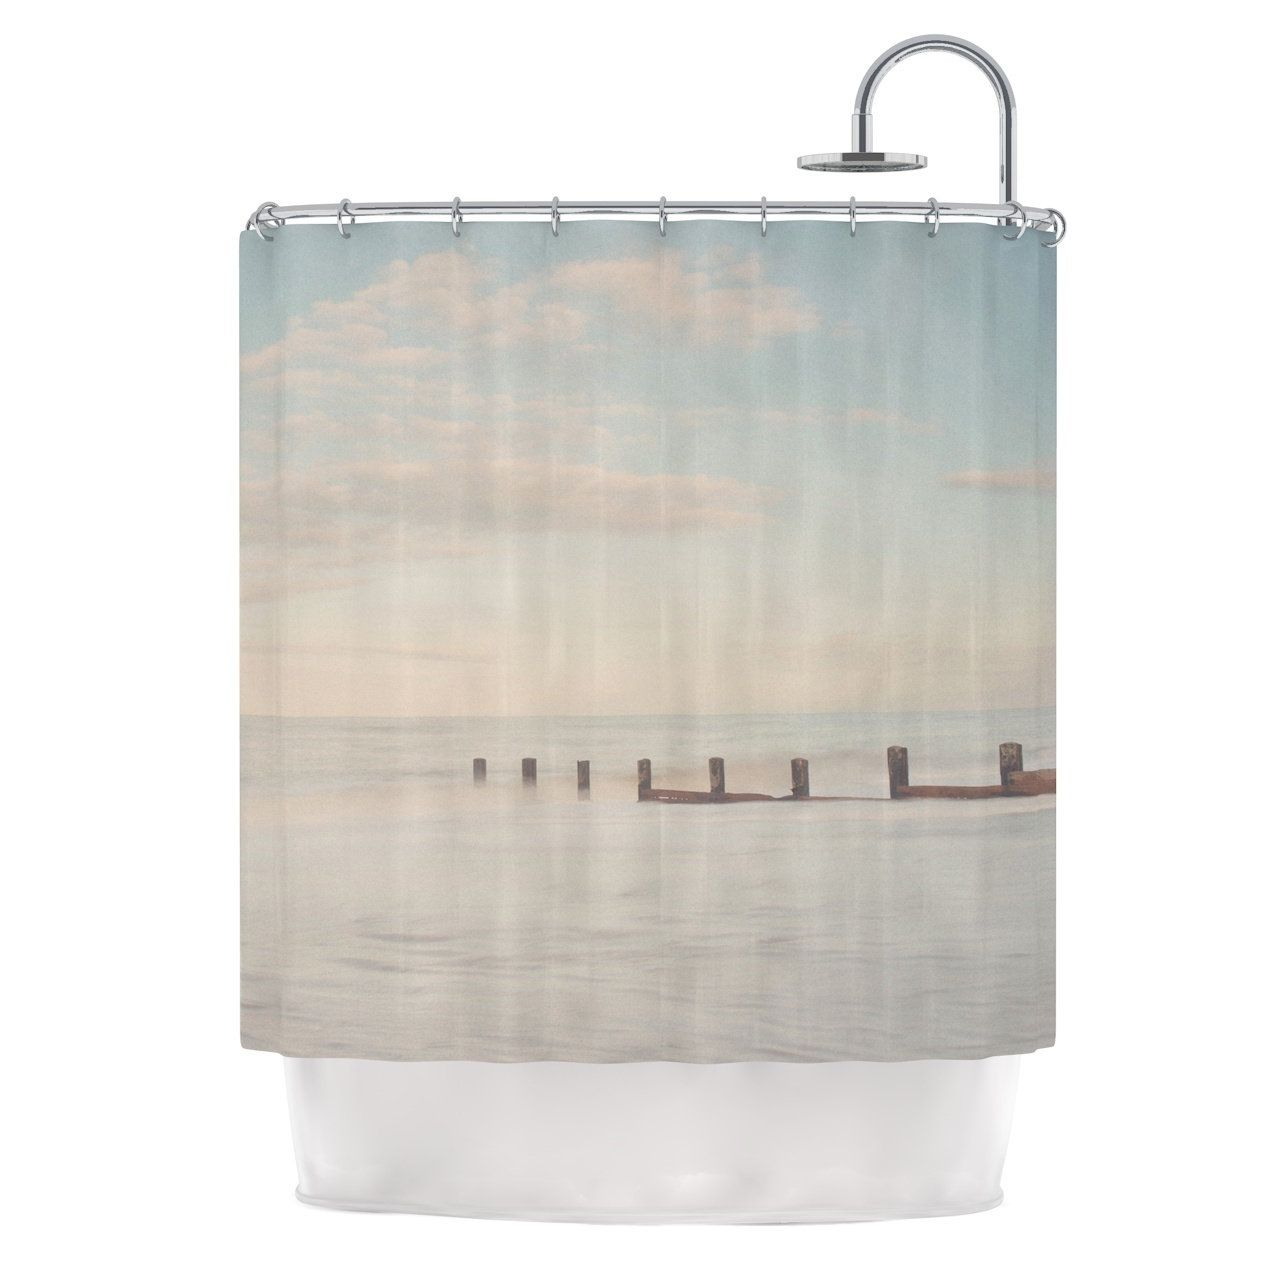 kess menards define barn salary curtain shower doors sale interior curtains designer